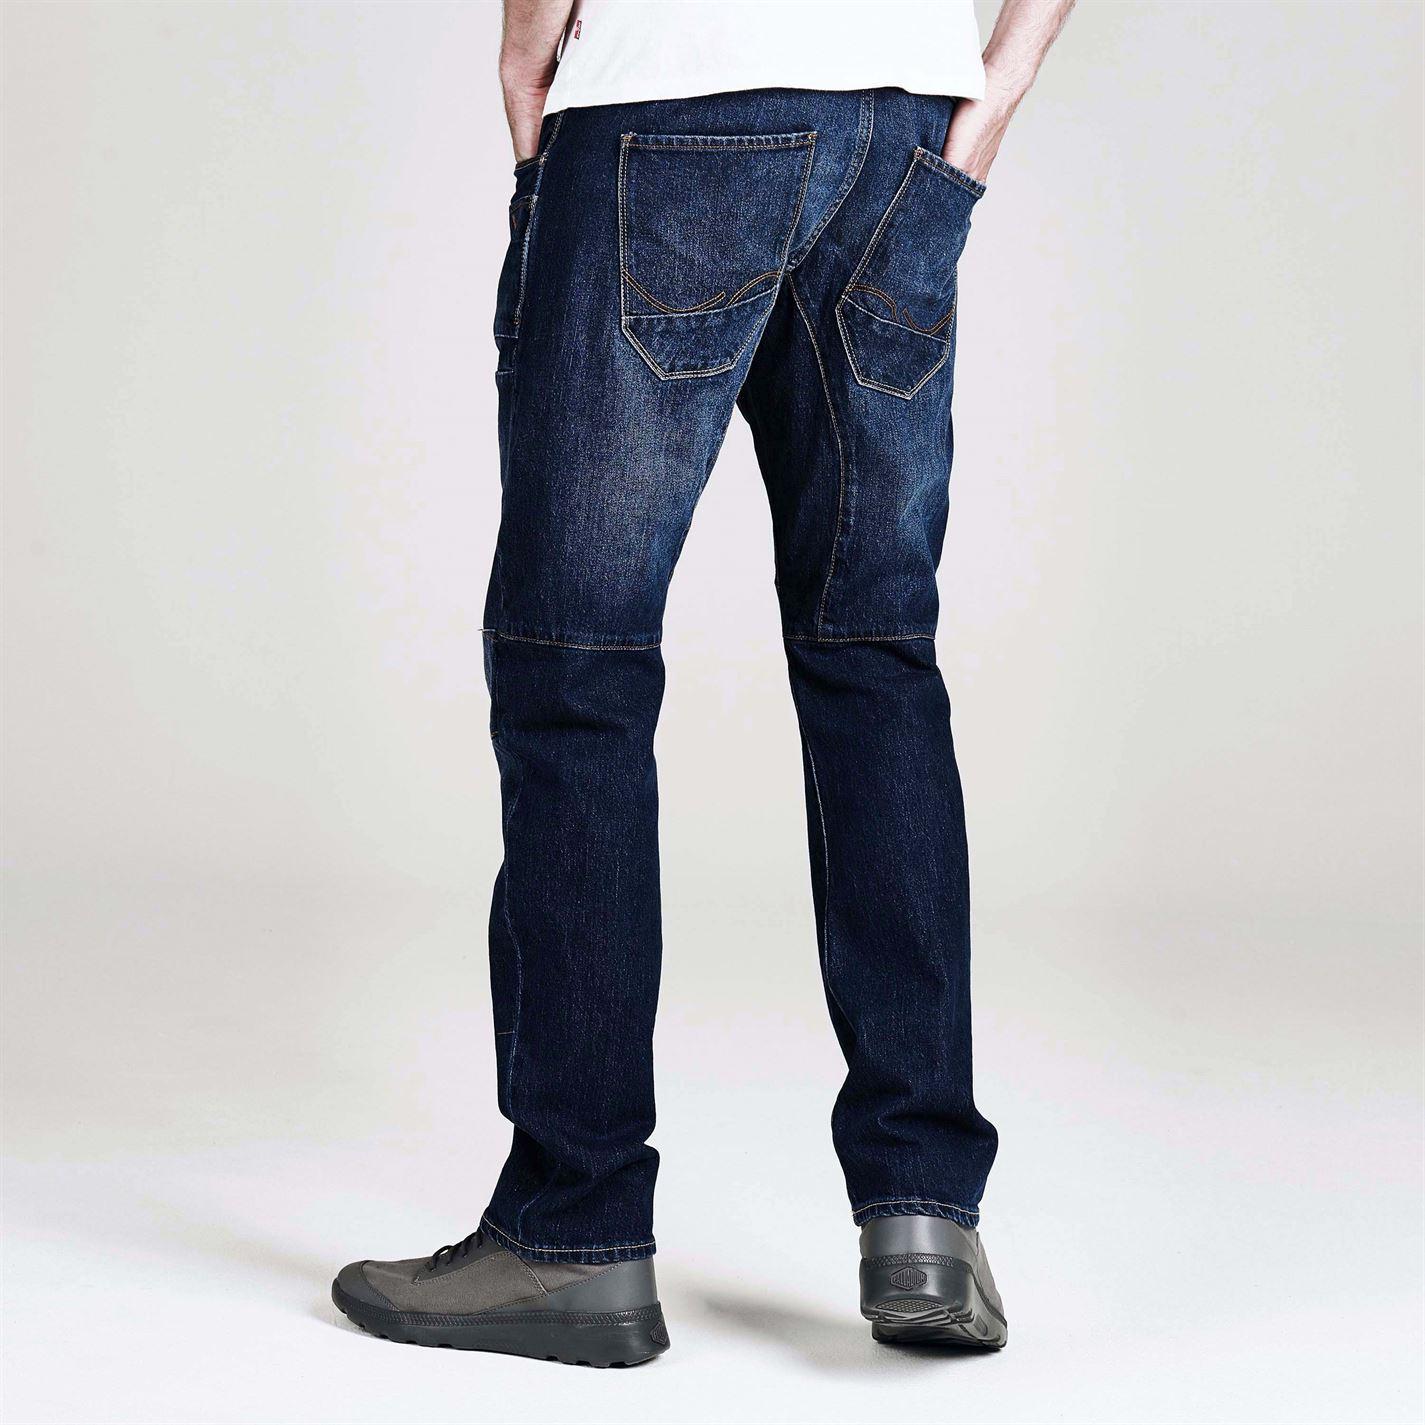 Jean-Denim-Jack-and-Jones-Stan-Osaka-Anti-Fit-de-Jean-para-Hombre-Pantalones-Pantalon-Oscuro-Wash miniatura 8